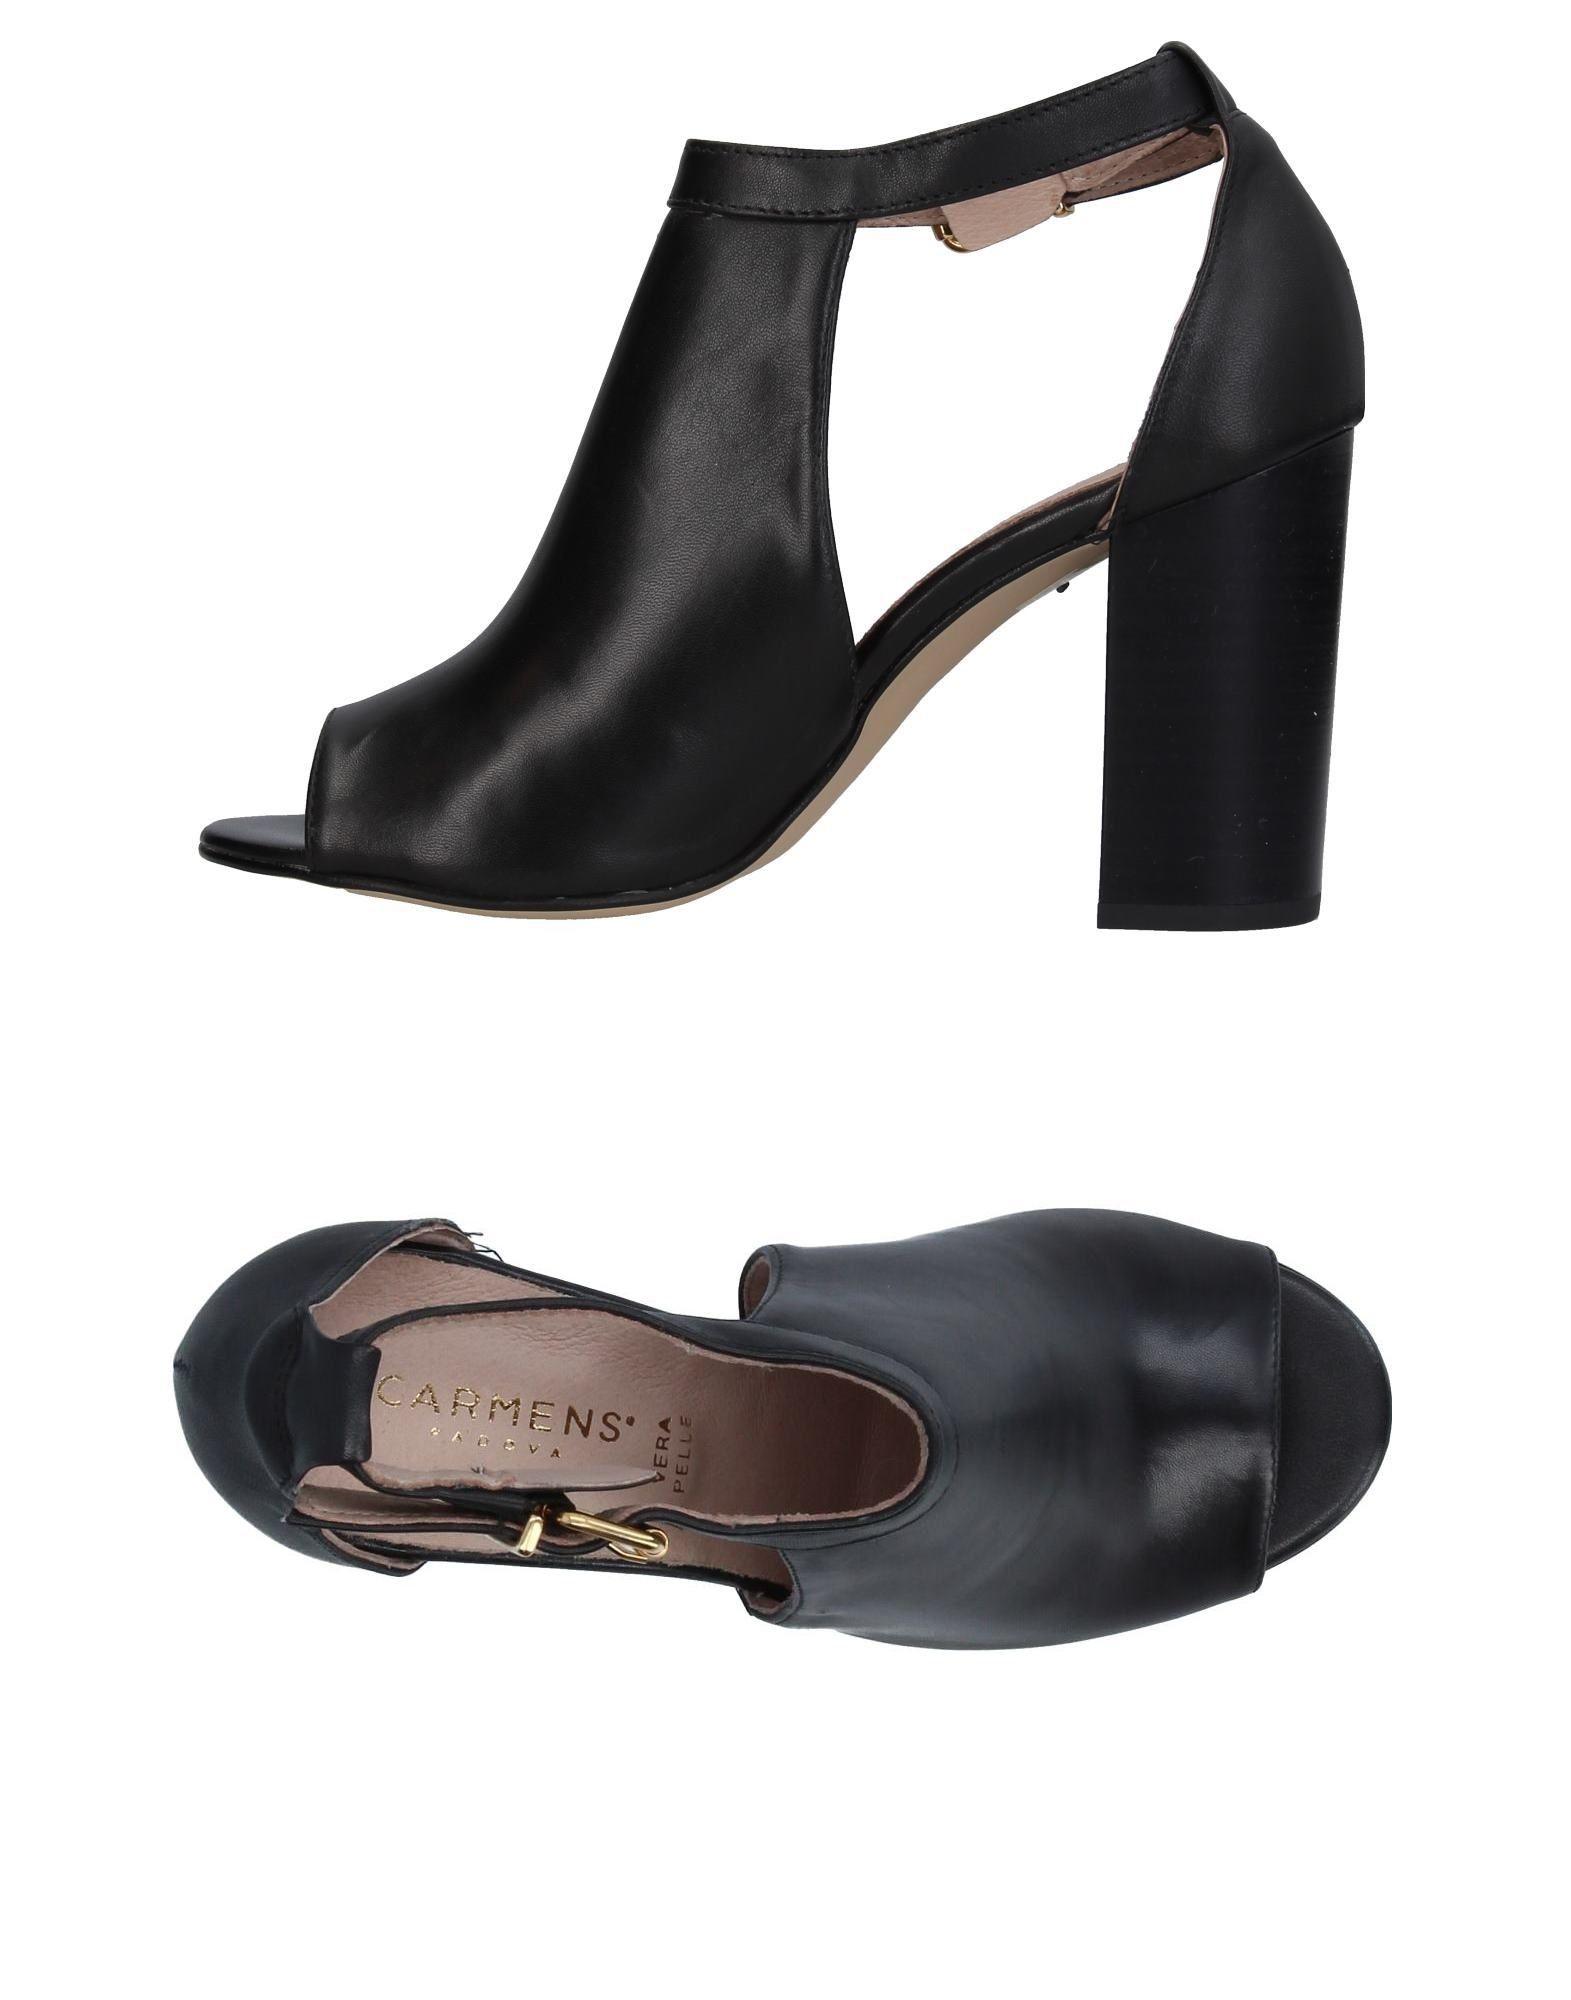 Carmens Sandalen beliebte Damen 11362047OV Gute Qualität beliebte Sandalen Schuhe 5c4961